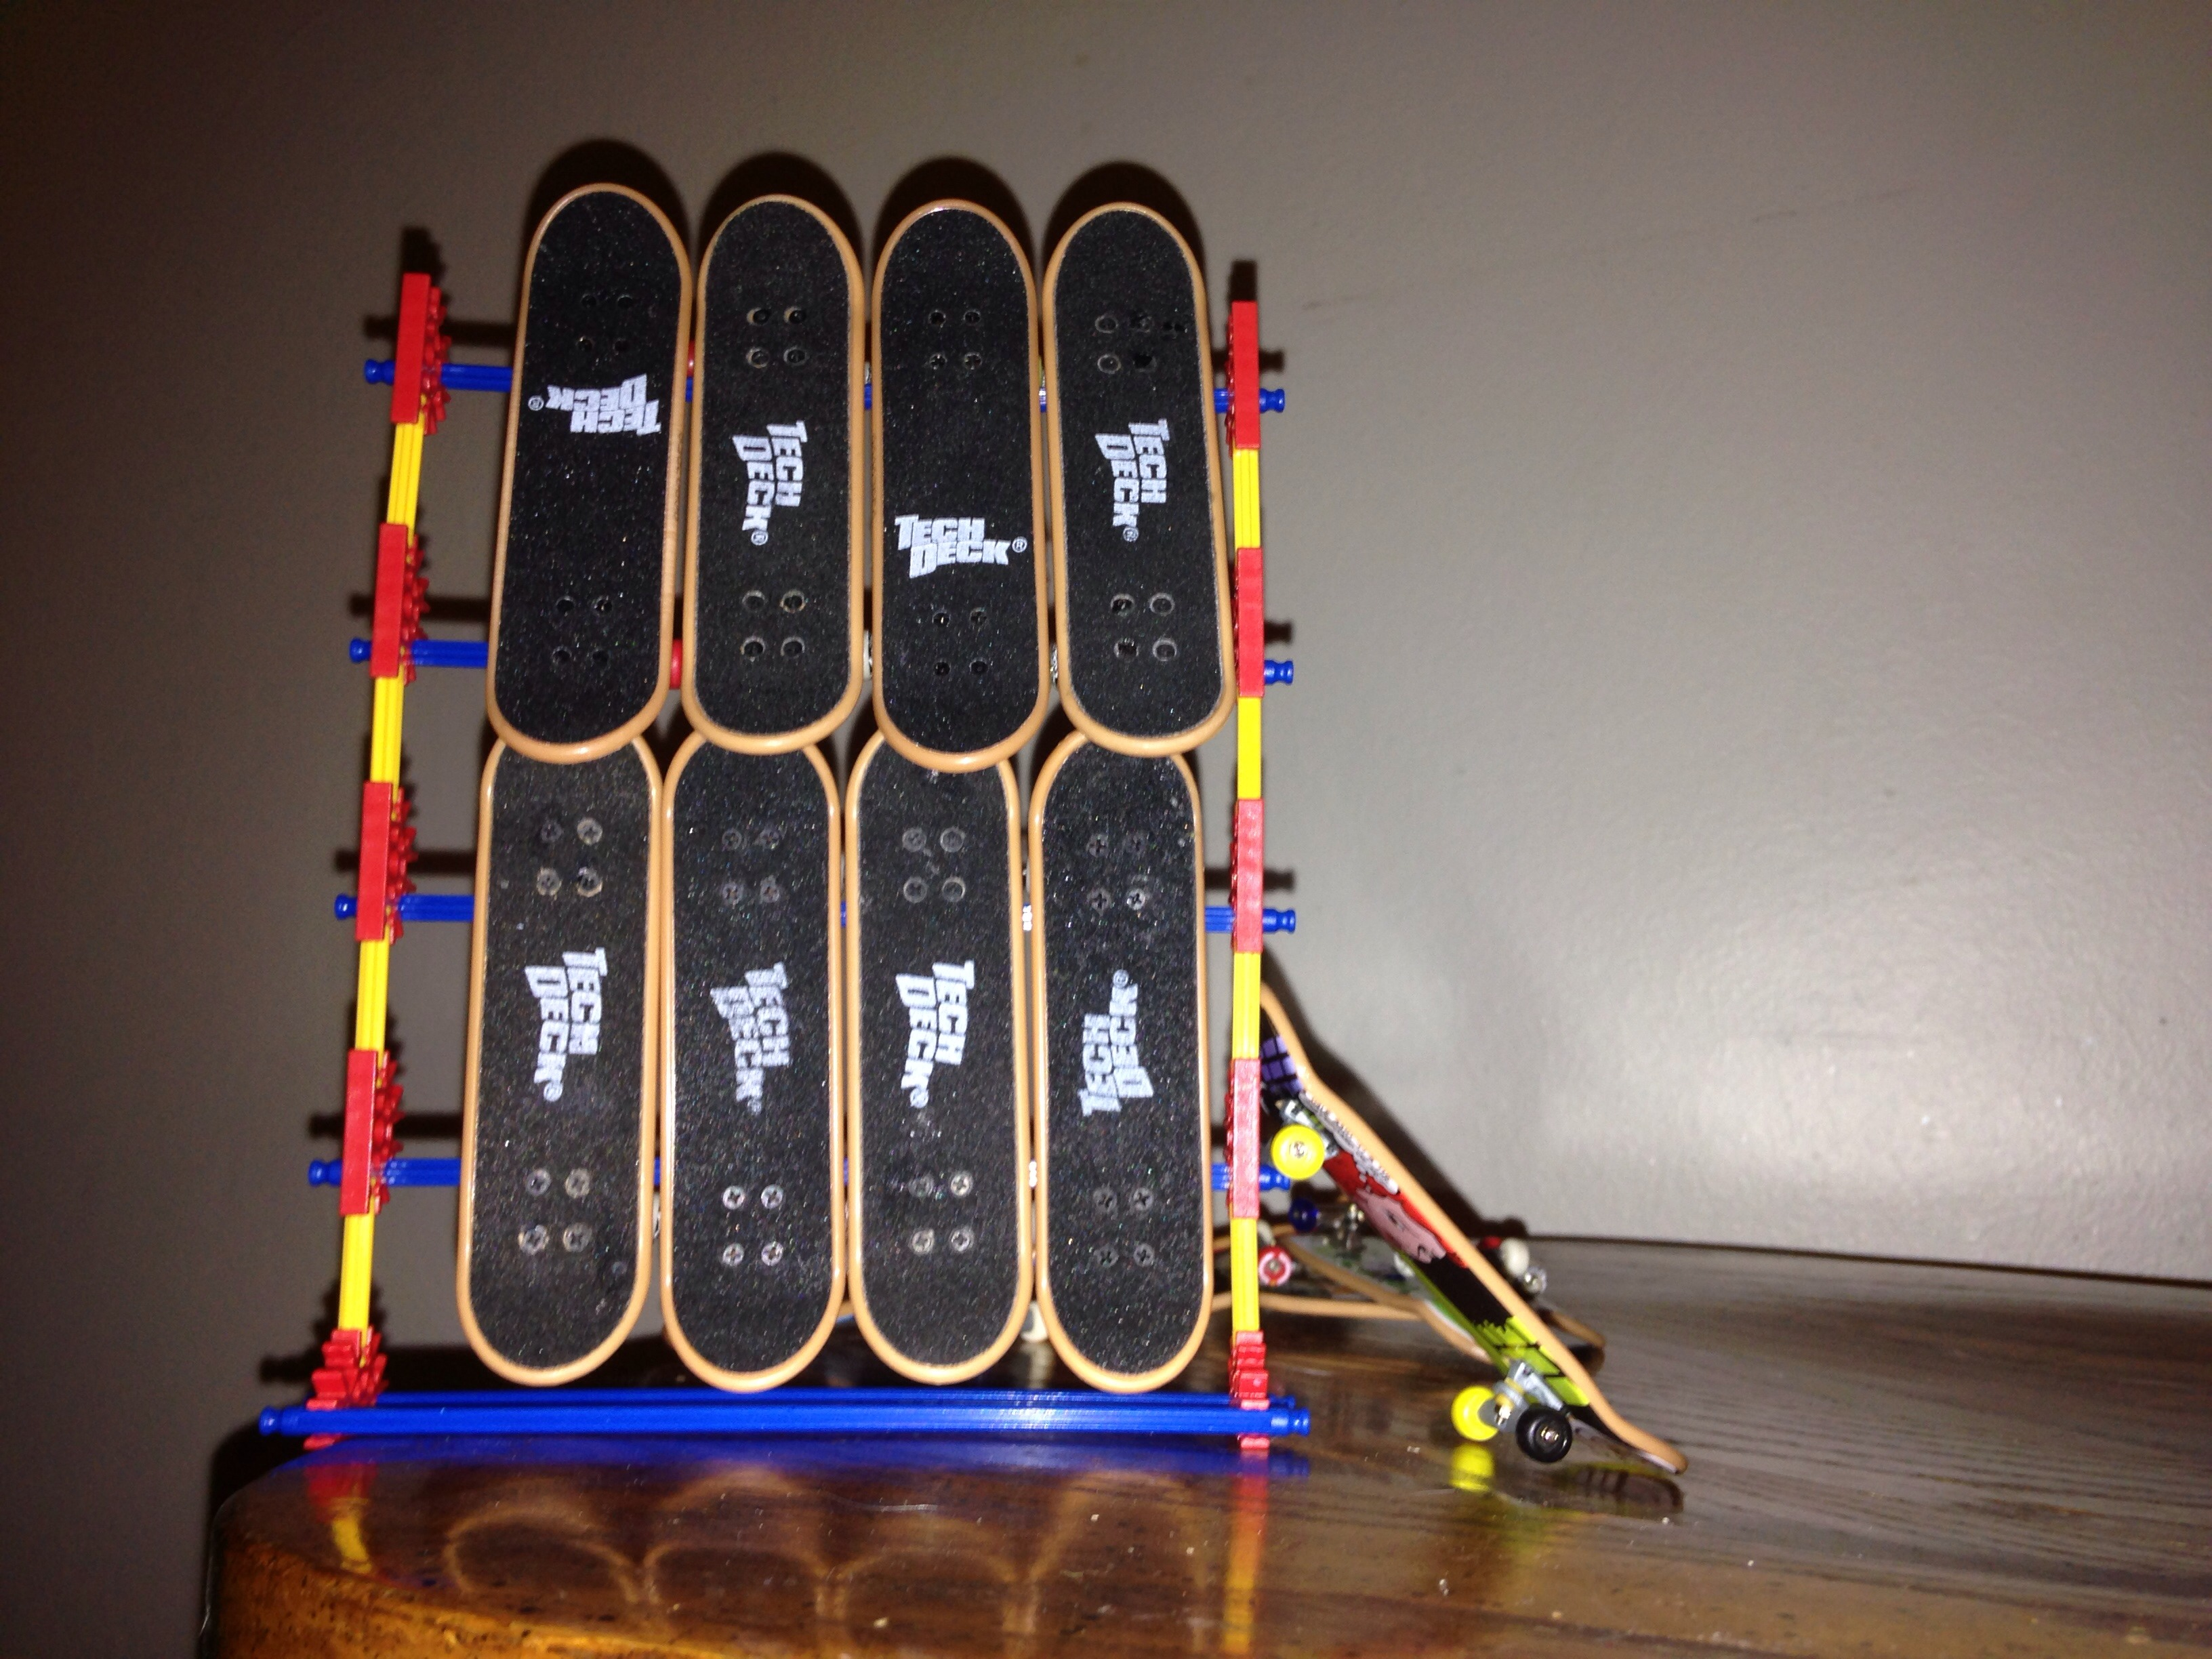 Picture of K'nex Tech Deck Stand (holds 8 Fingerboard Decks)